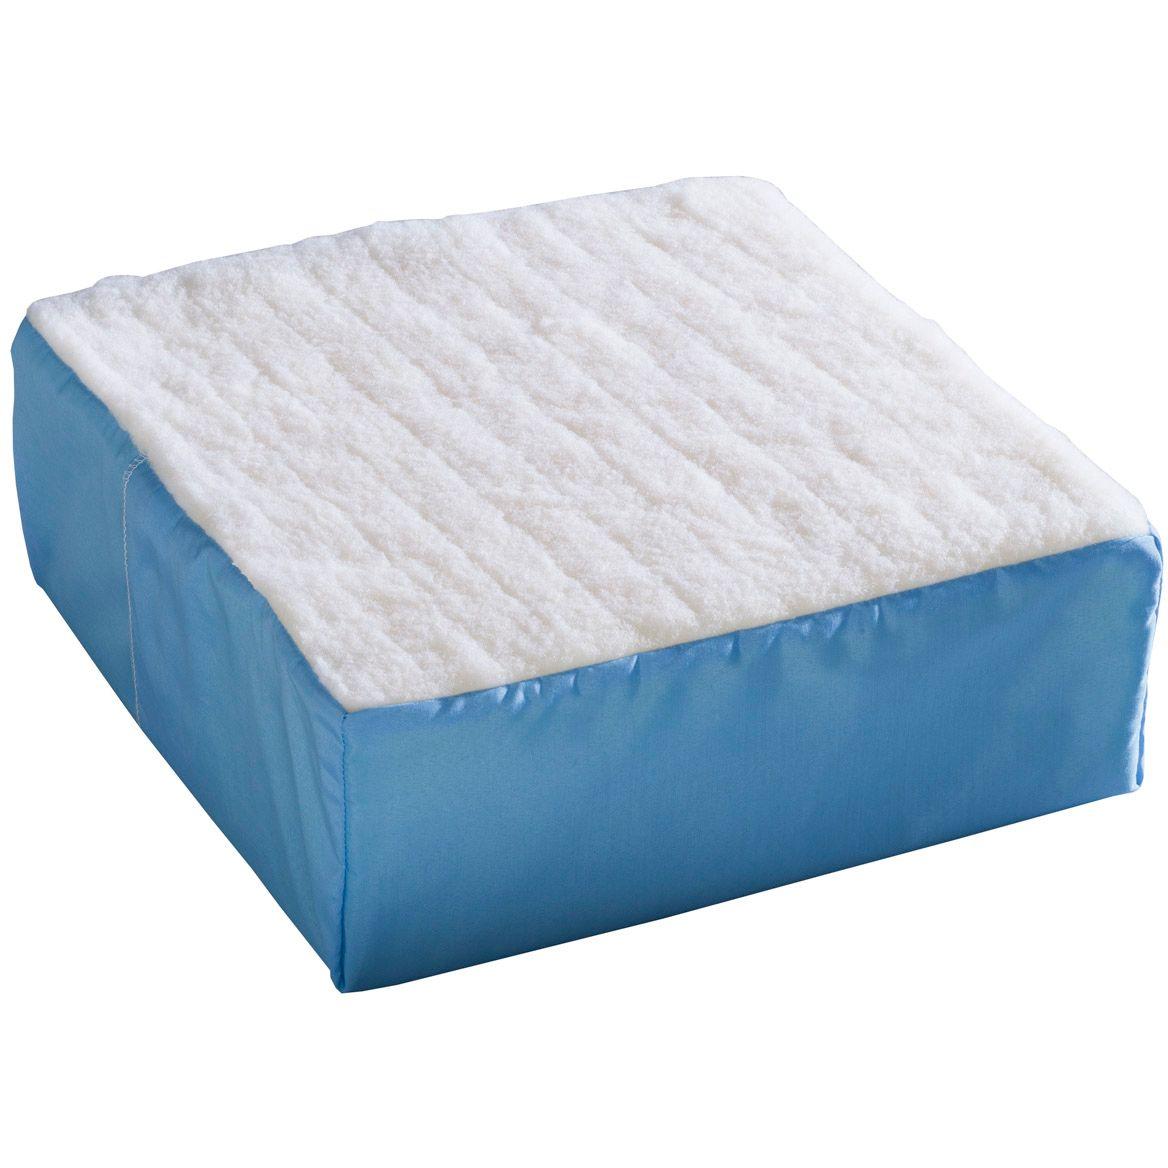 Medium Firm Easy Rise Cushion-348729